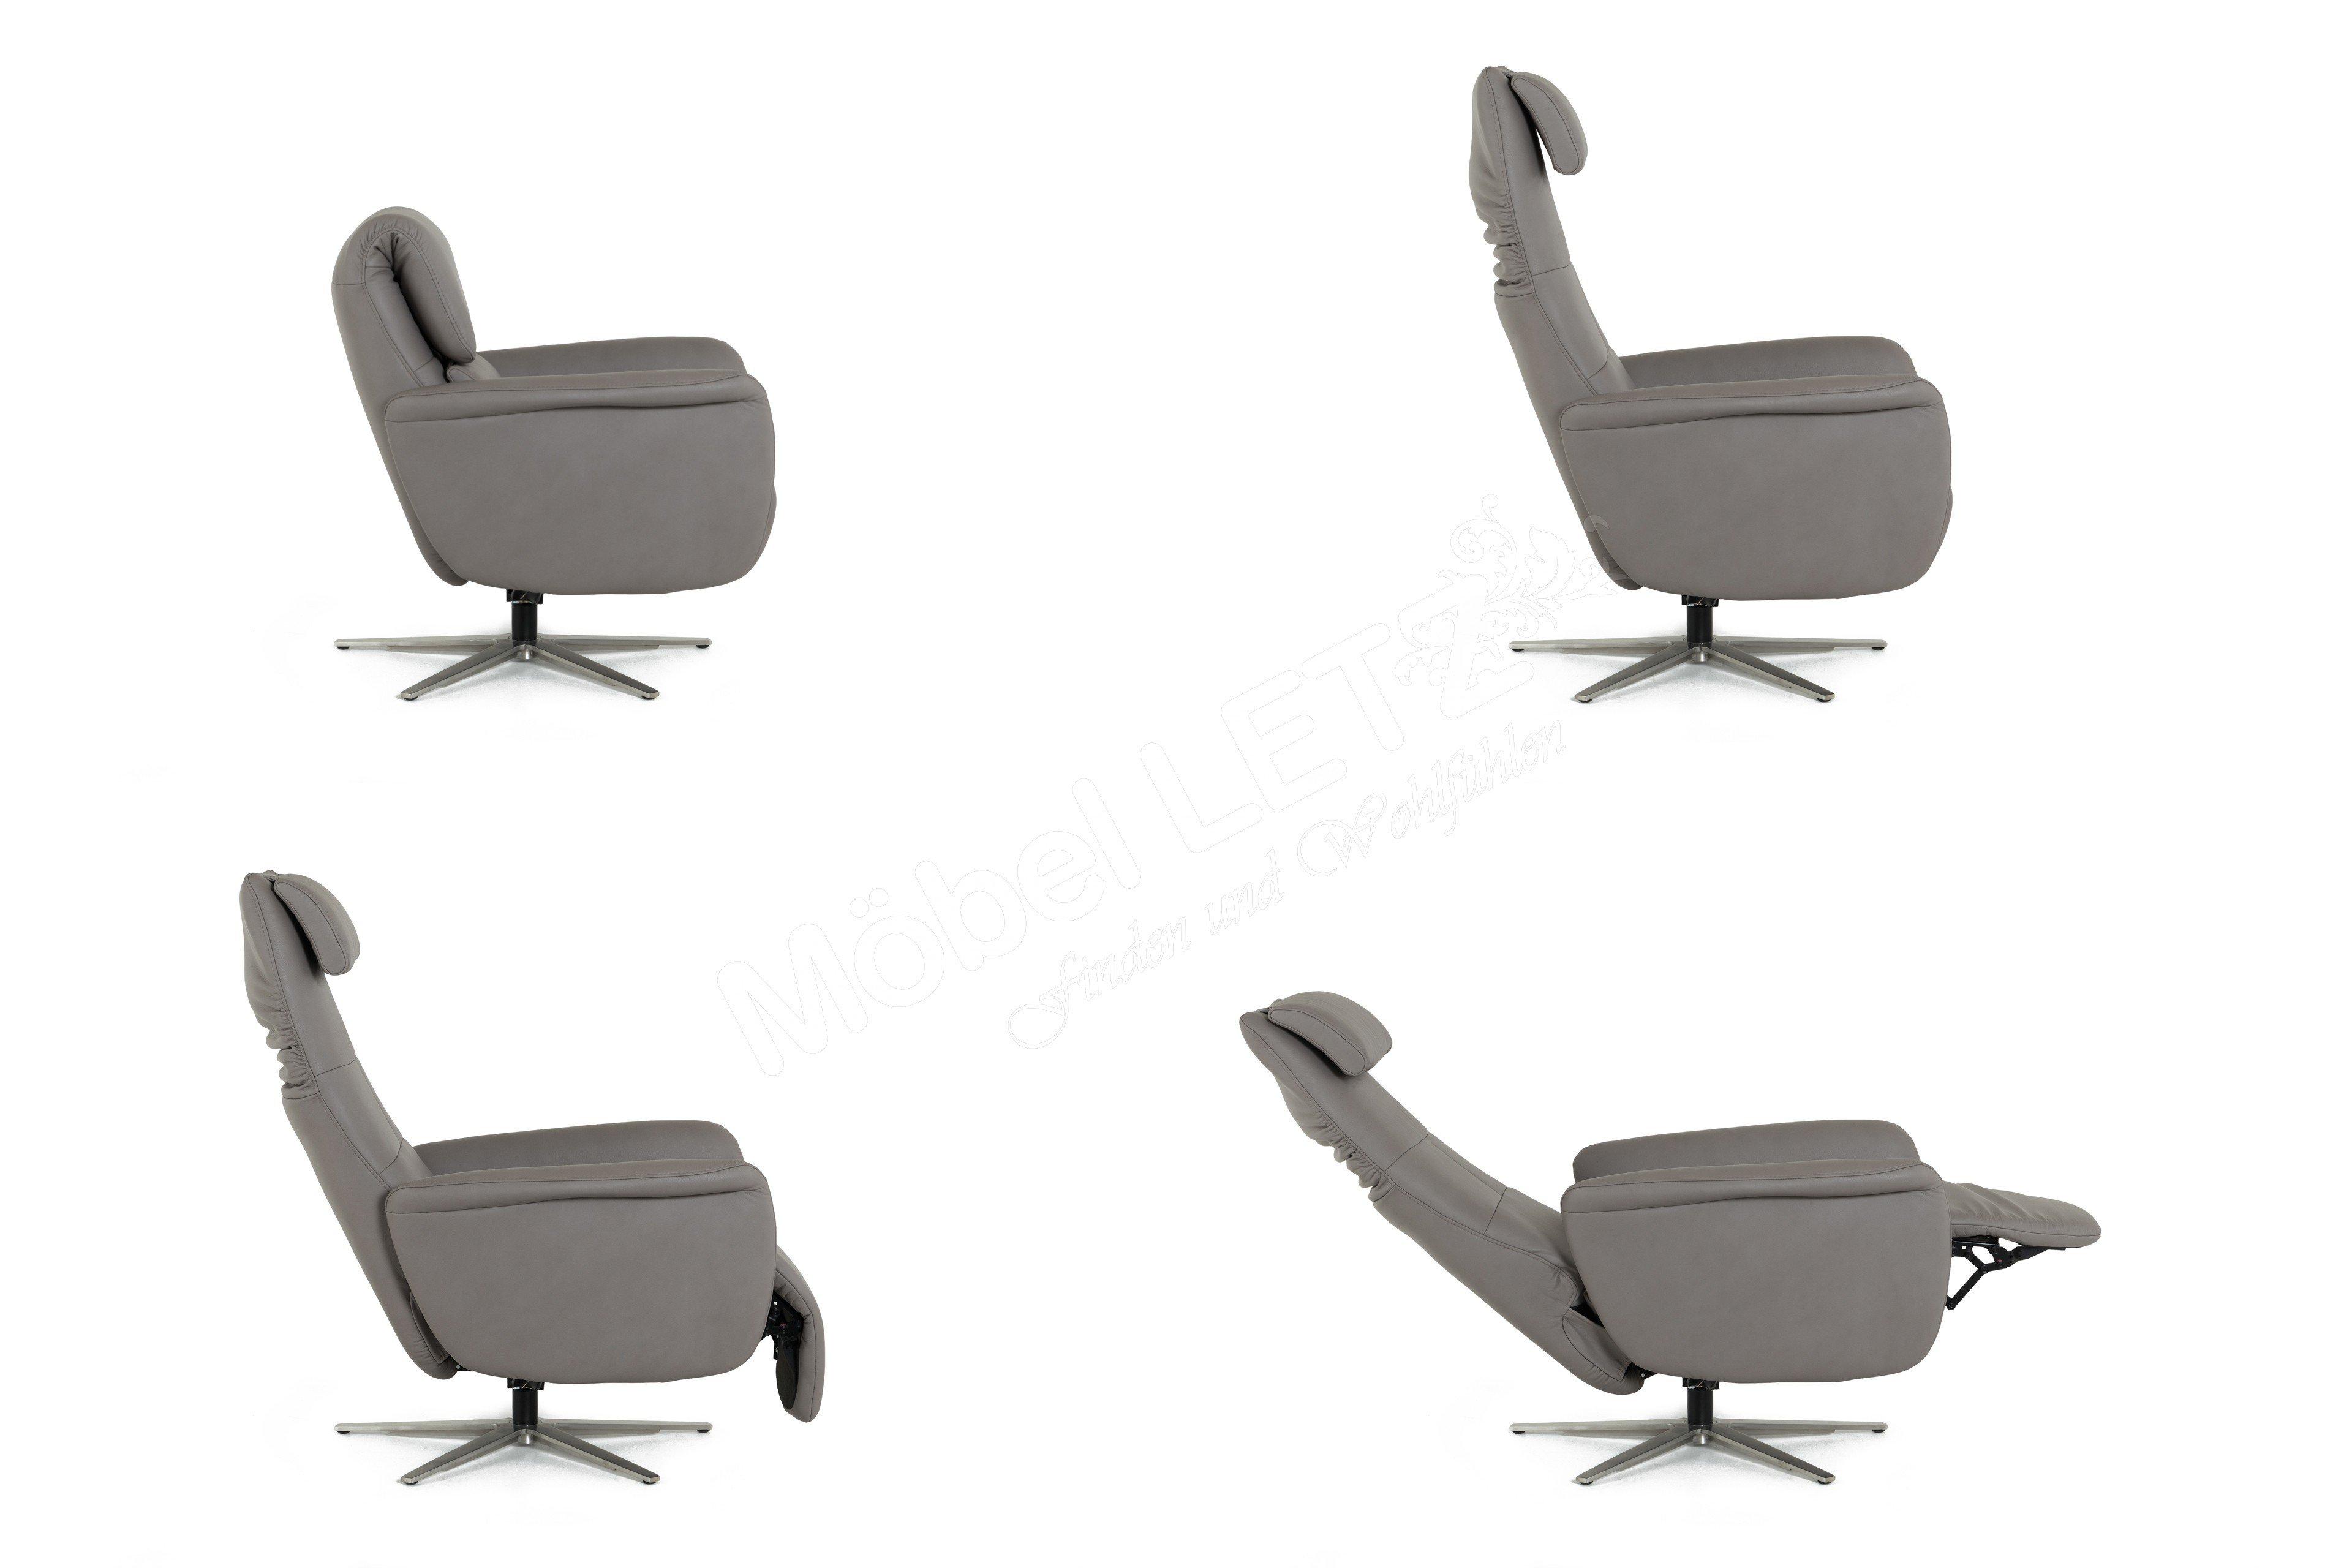 Hukla Lc02 Relaxsessel In Grau Möbel Letz Ihr Online Shop